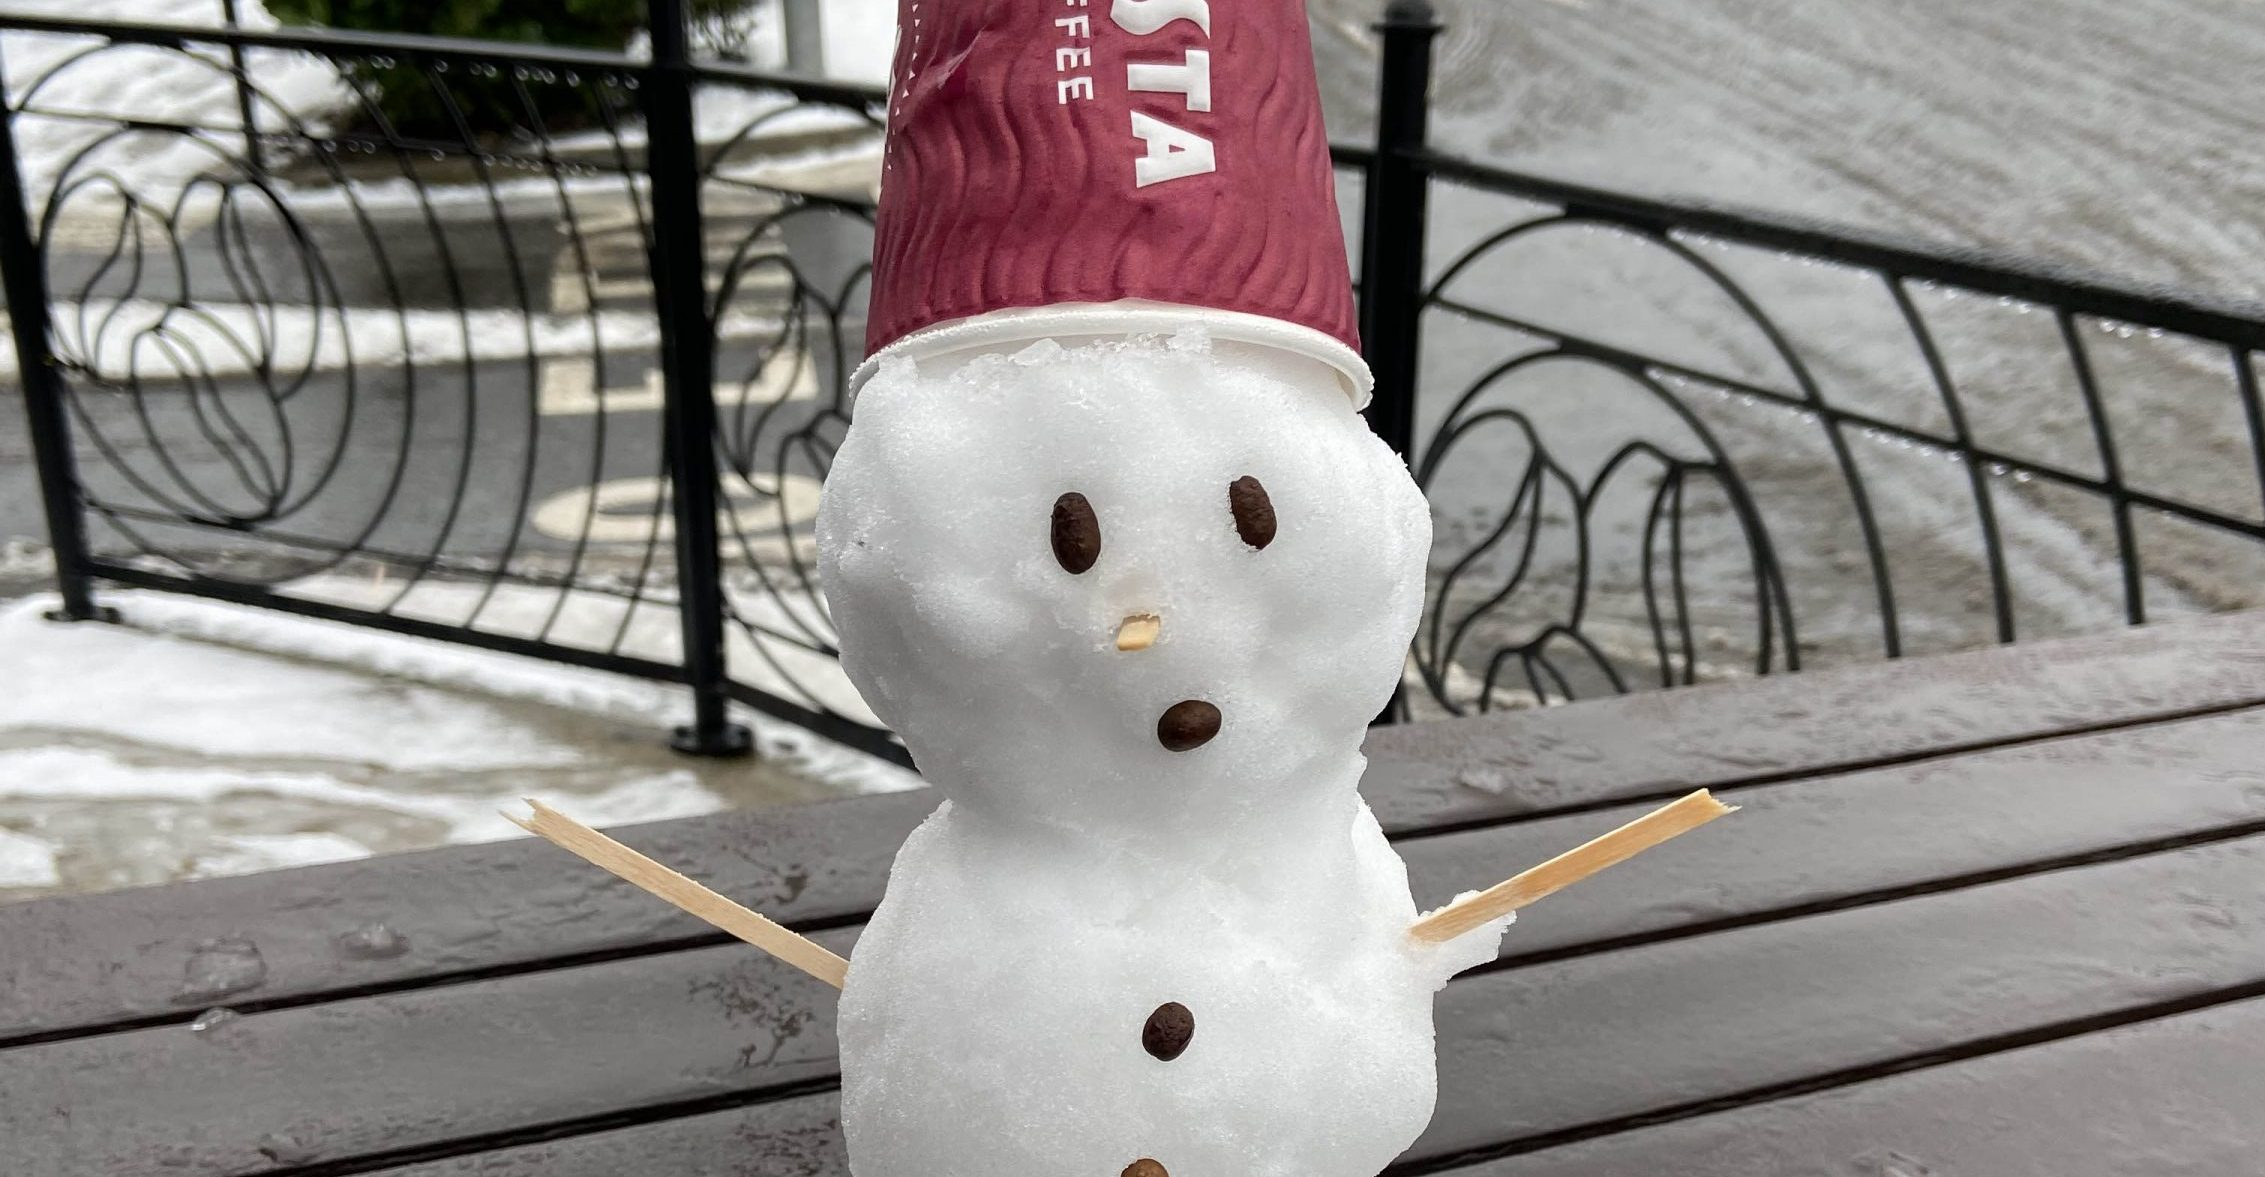 Snowman made using Costa Coffee utensils